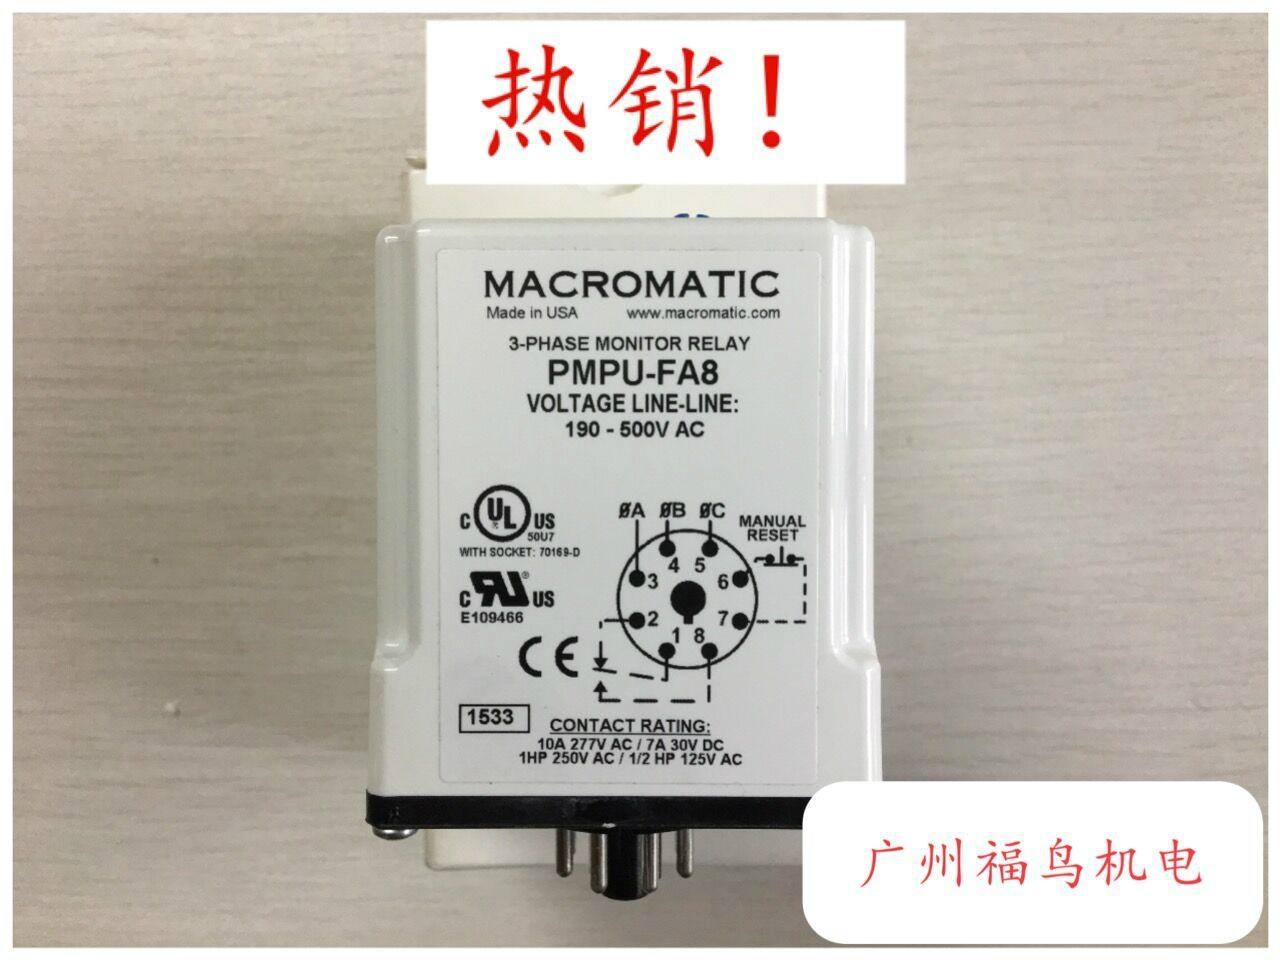 MACROMATIC控制继电器, 型号: PMPU-FA8